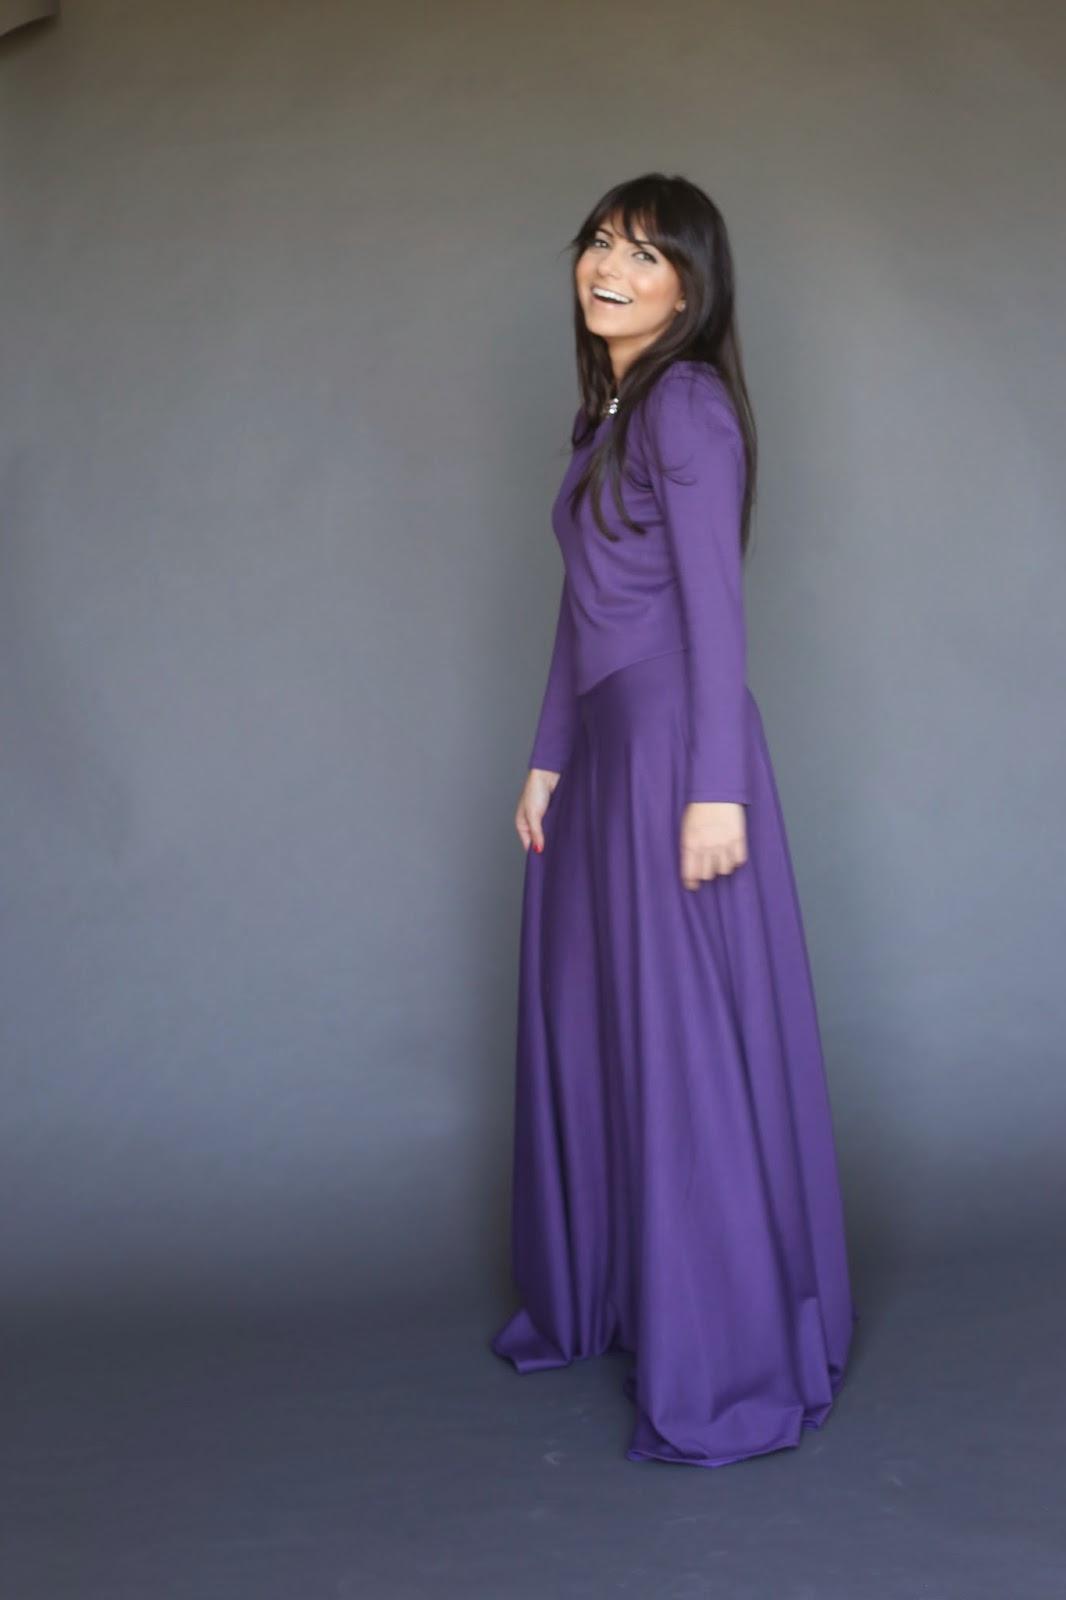 royal purple long sleeve modest maxi dress with full skirt full length formal dress hijab tznius mormon mission Mode-sty